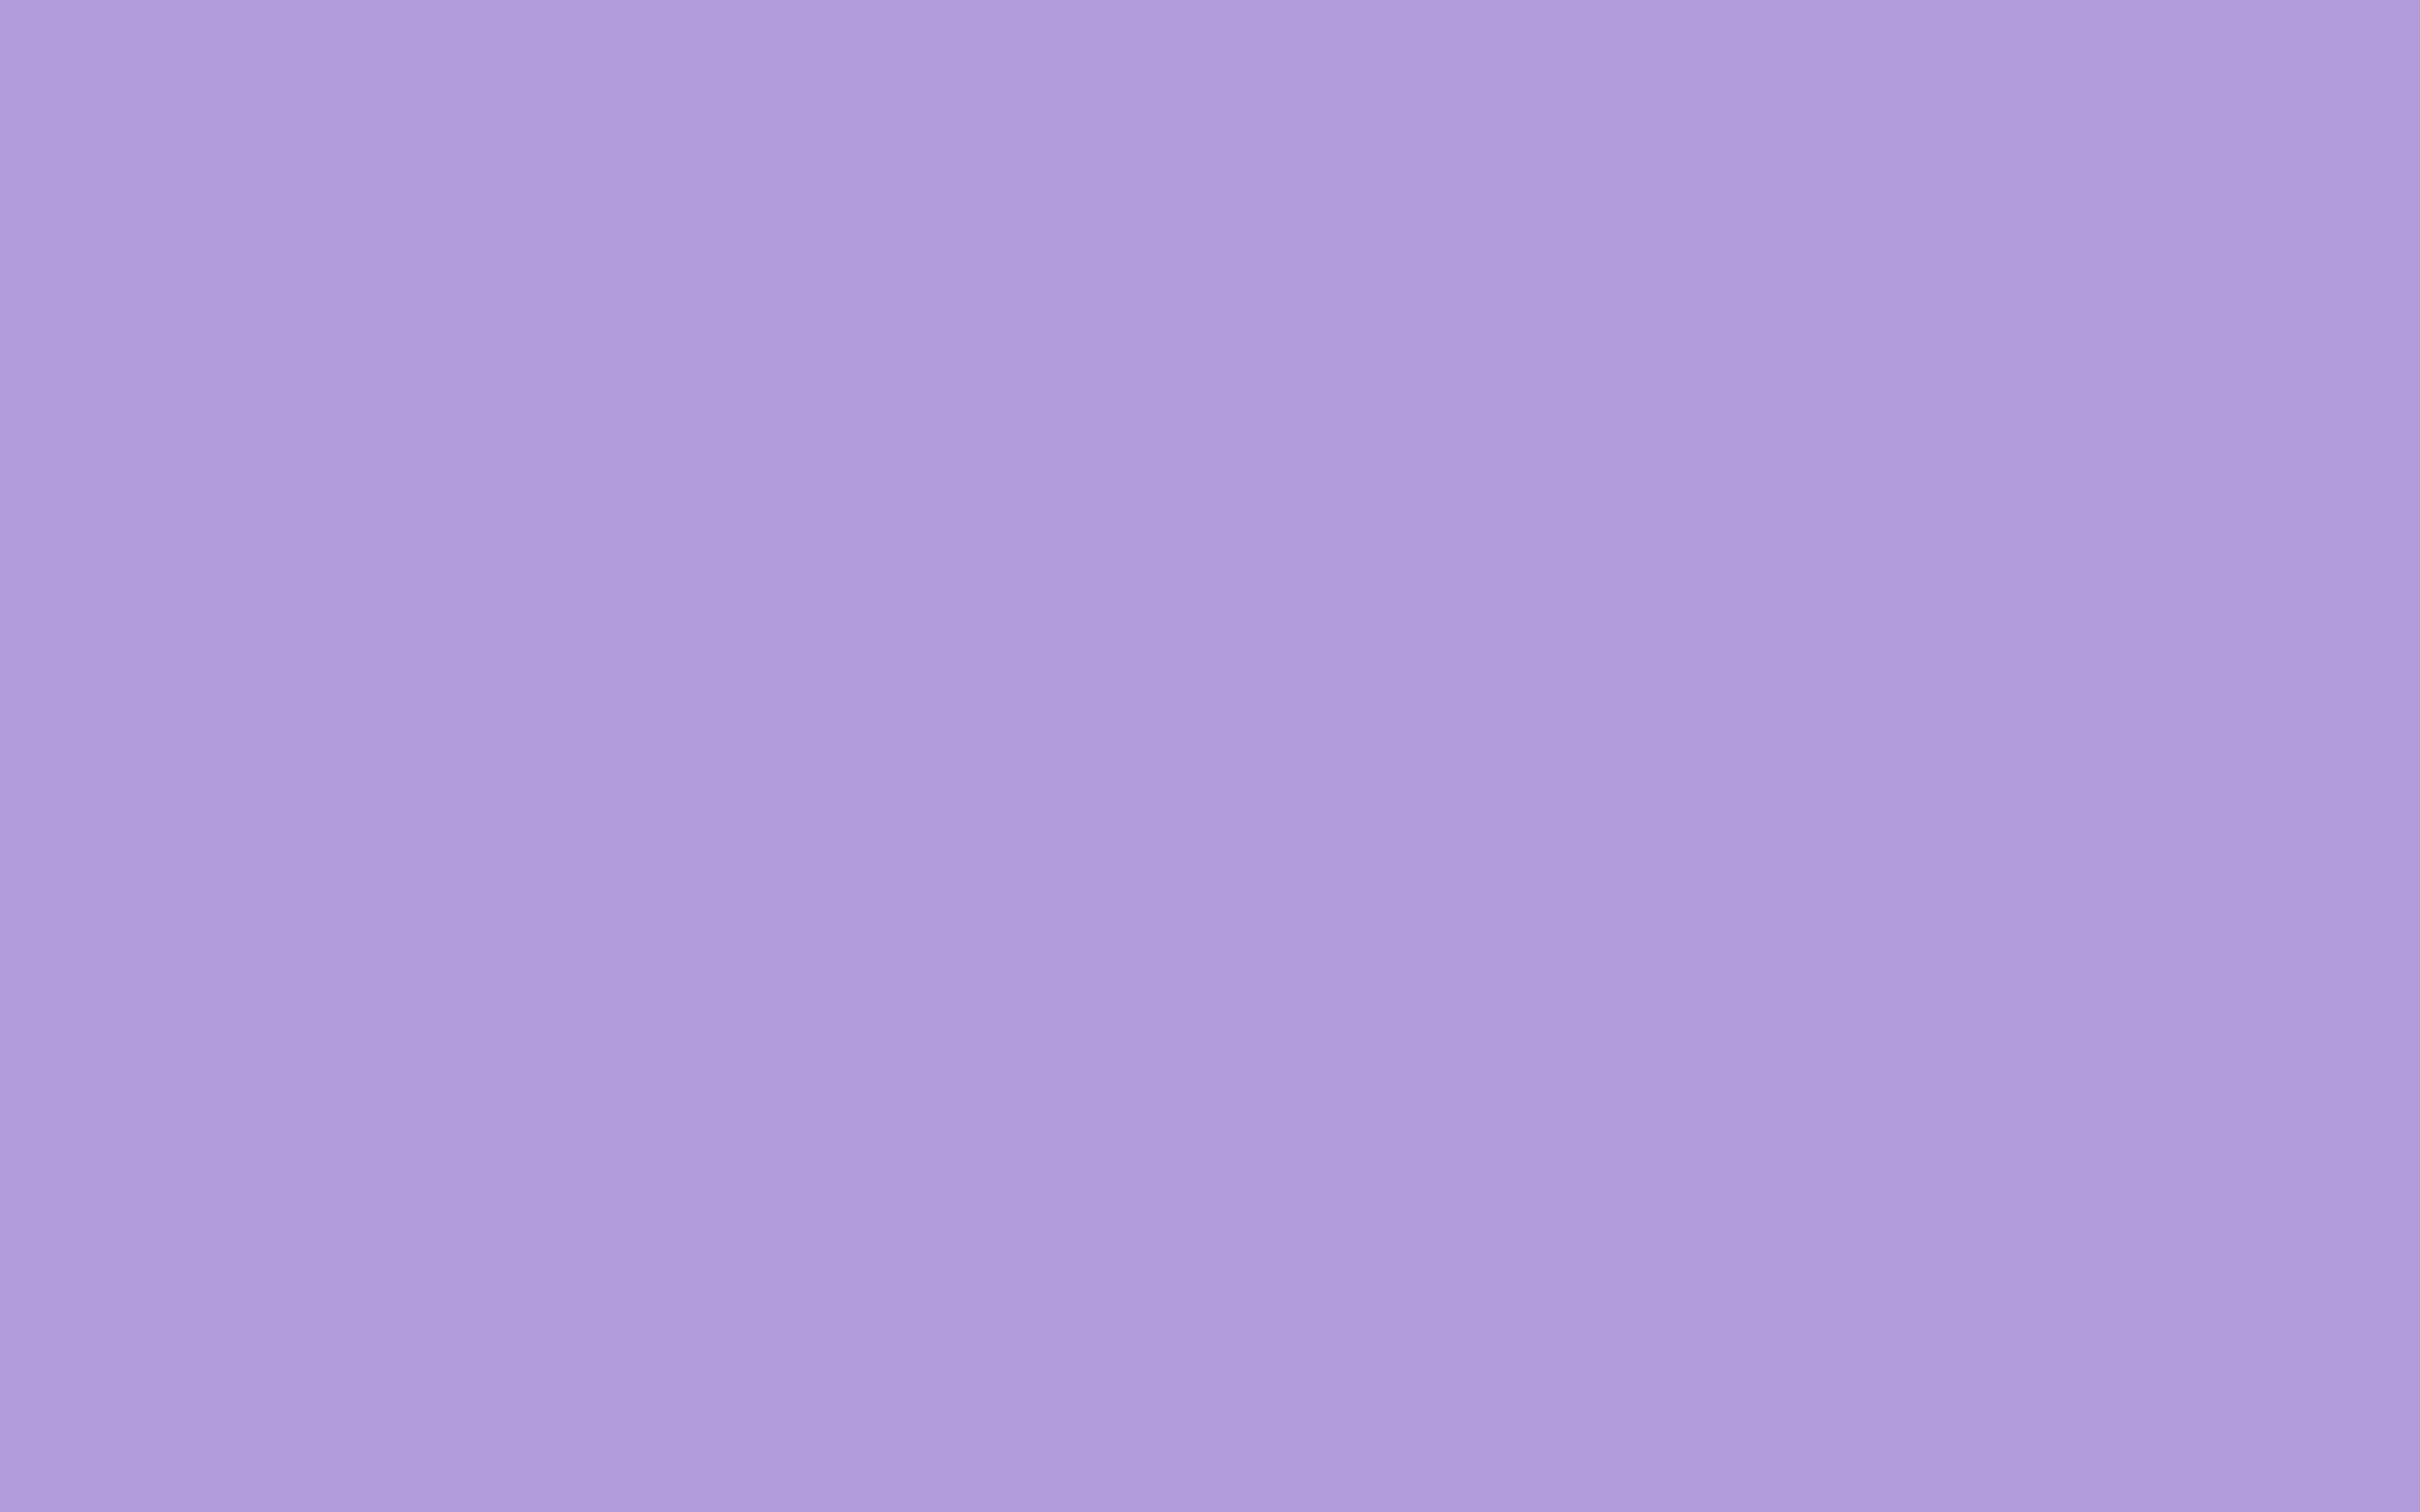 2560x1600 Light Pastel Purple Solid Color Background